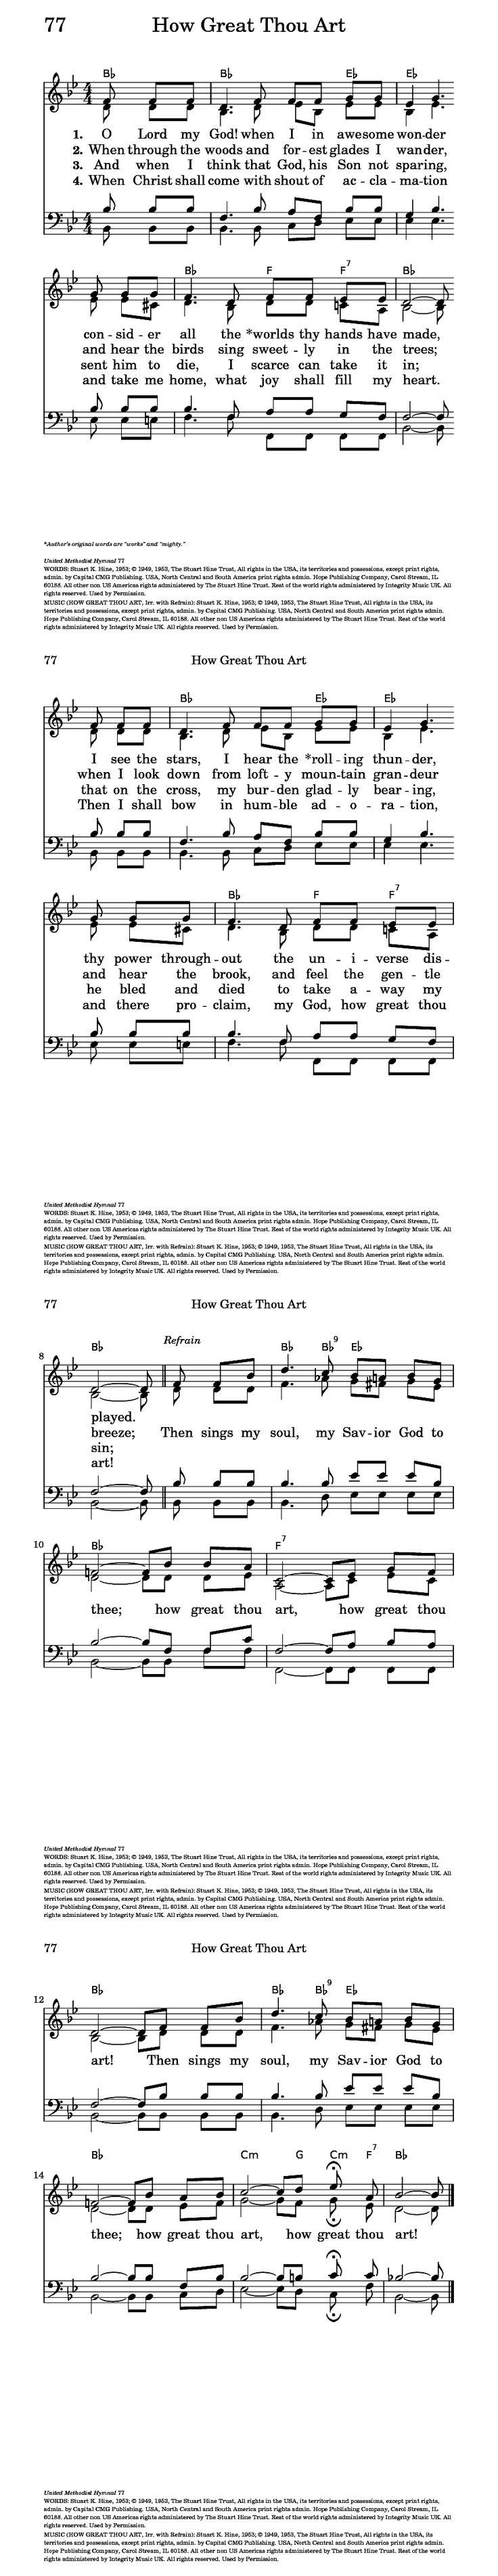 How great thou art greatful song lyrics hymn